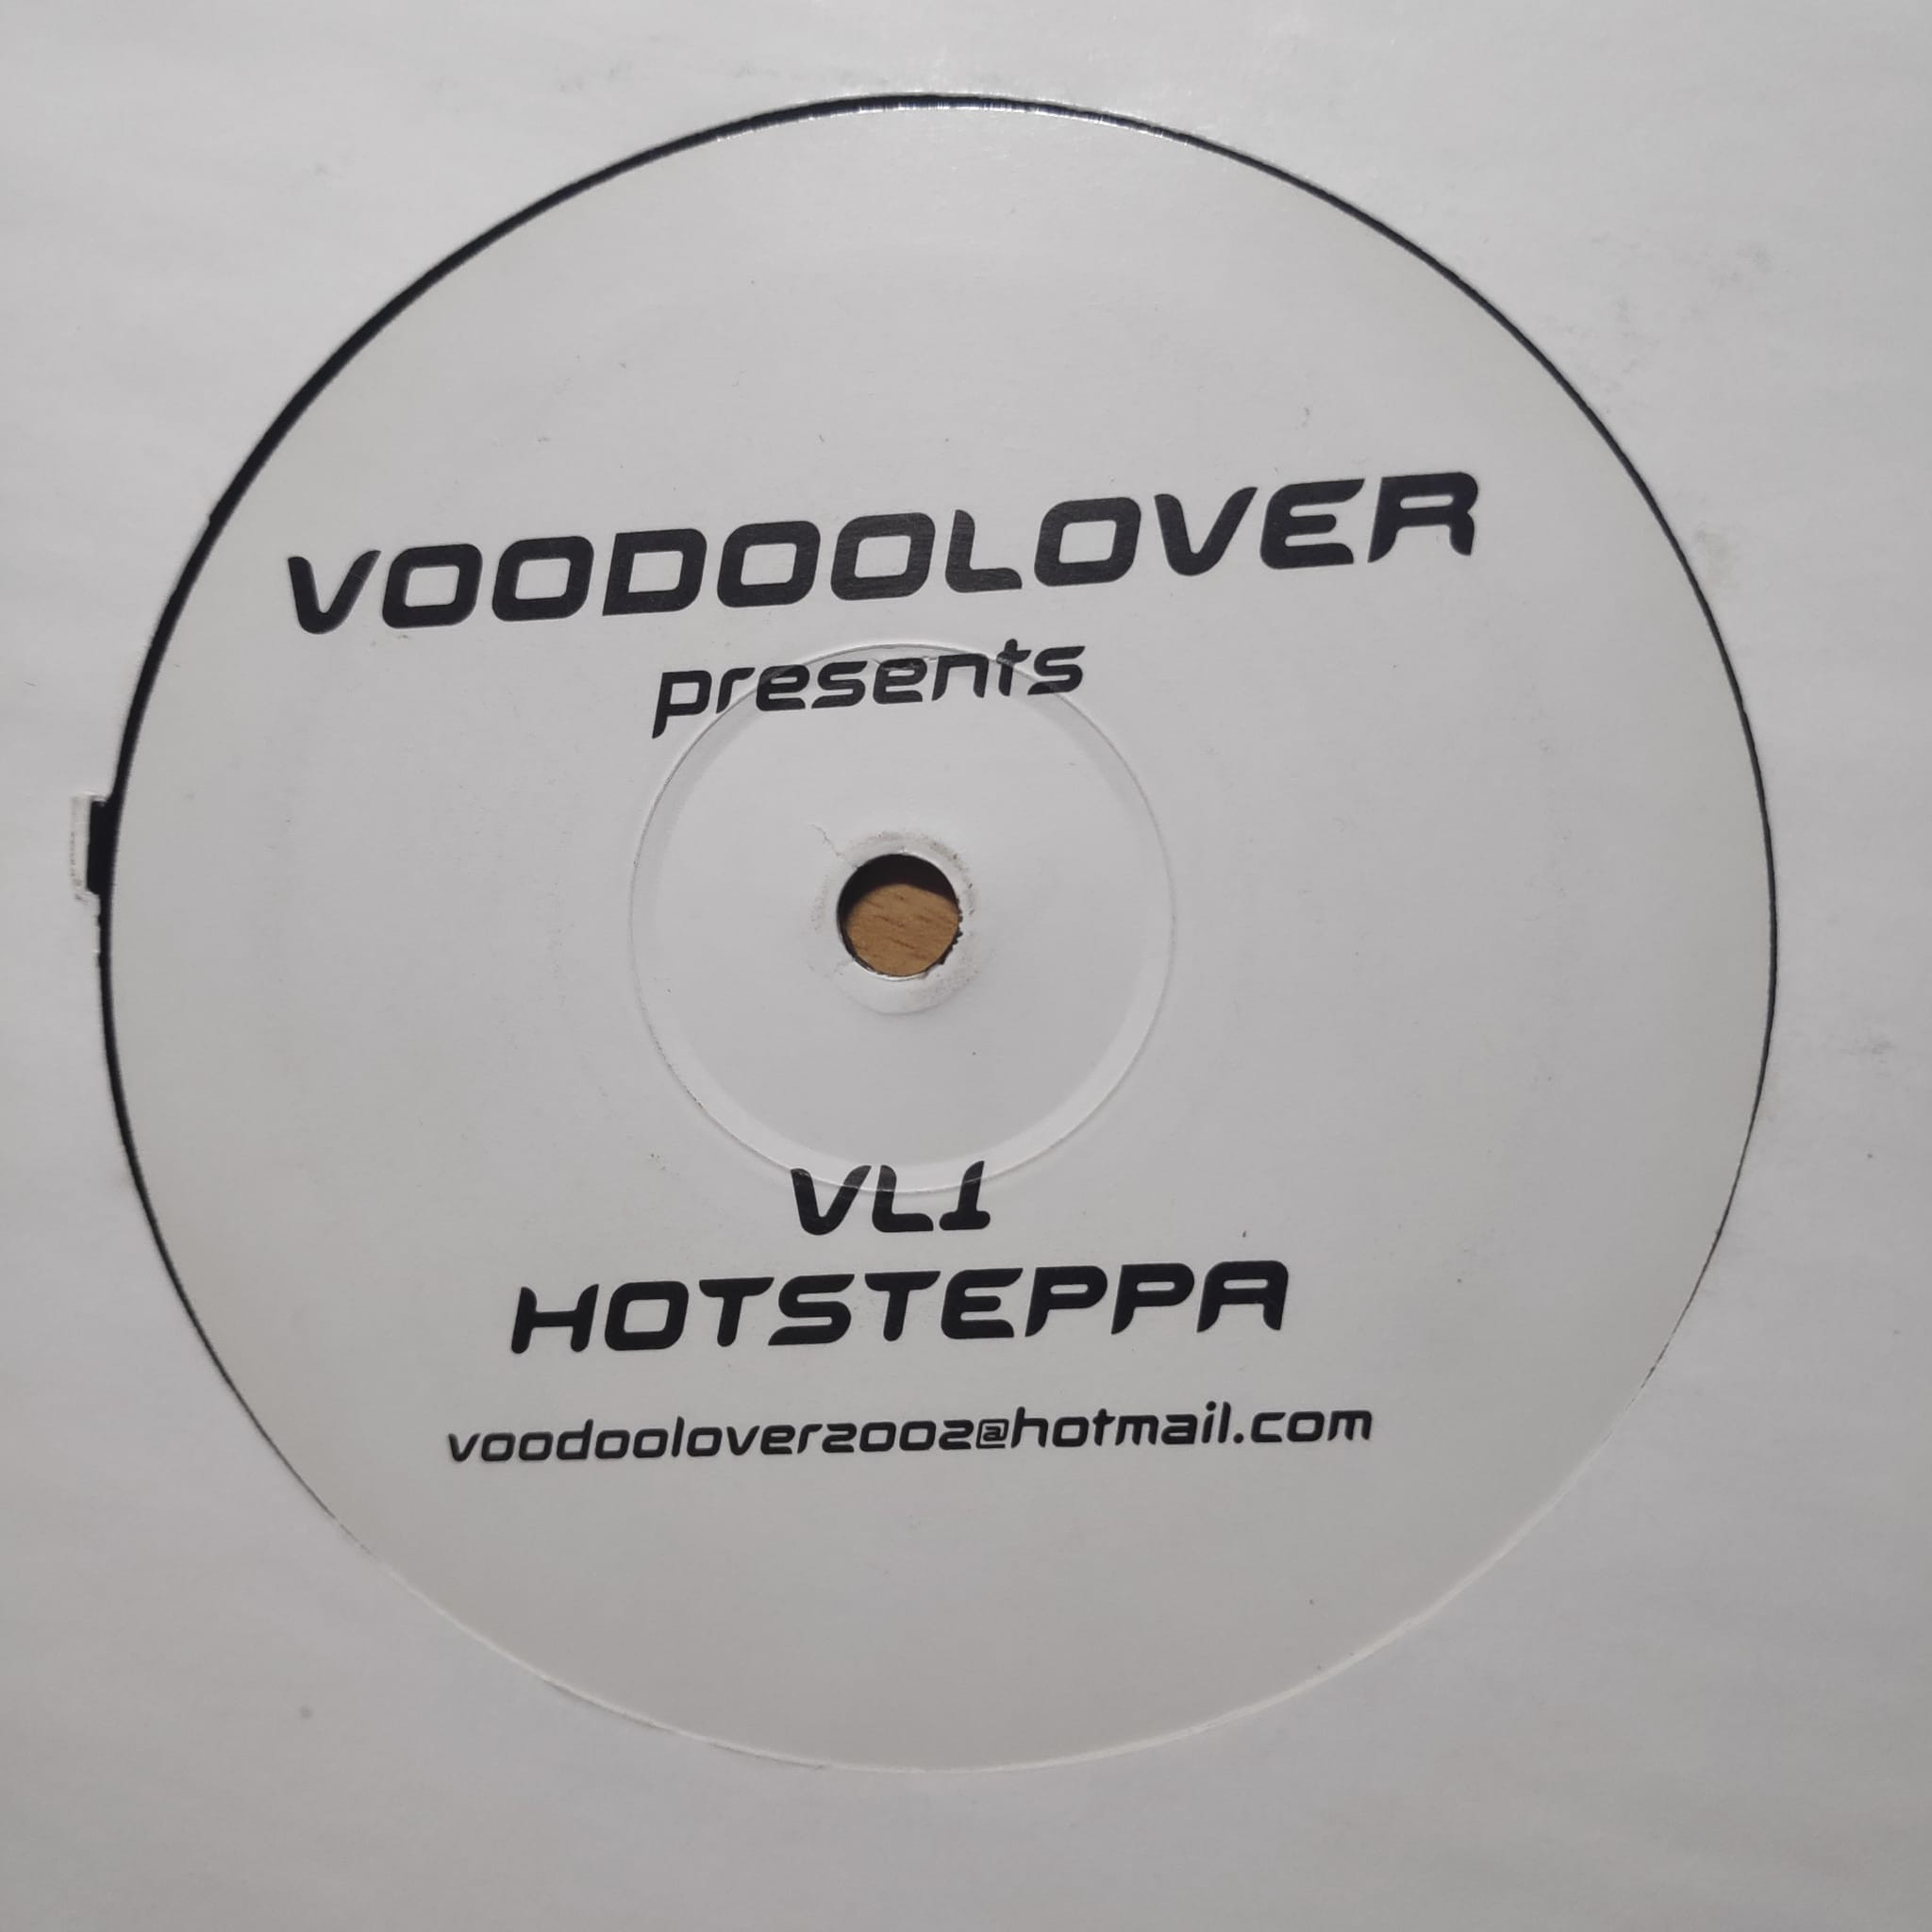 (PZ63) Alex K Vs. Voodoolover – Hotsteppa